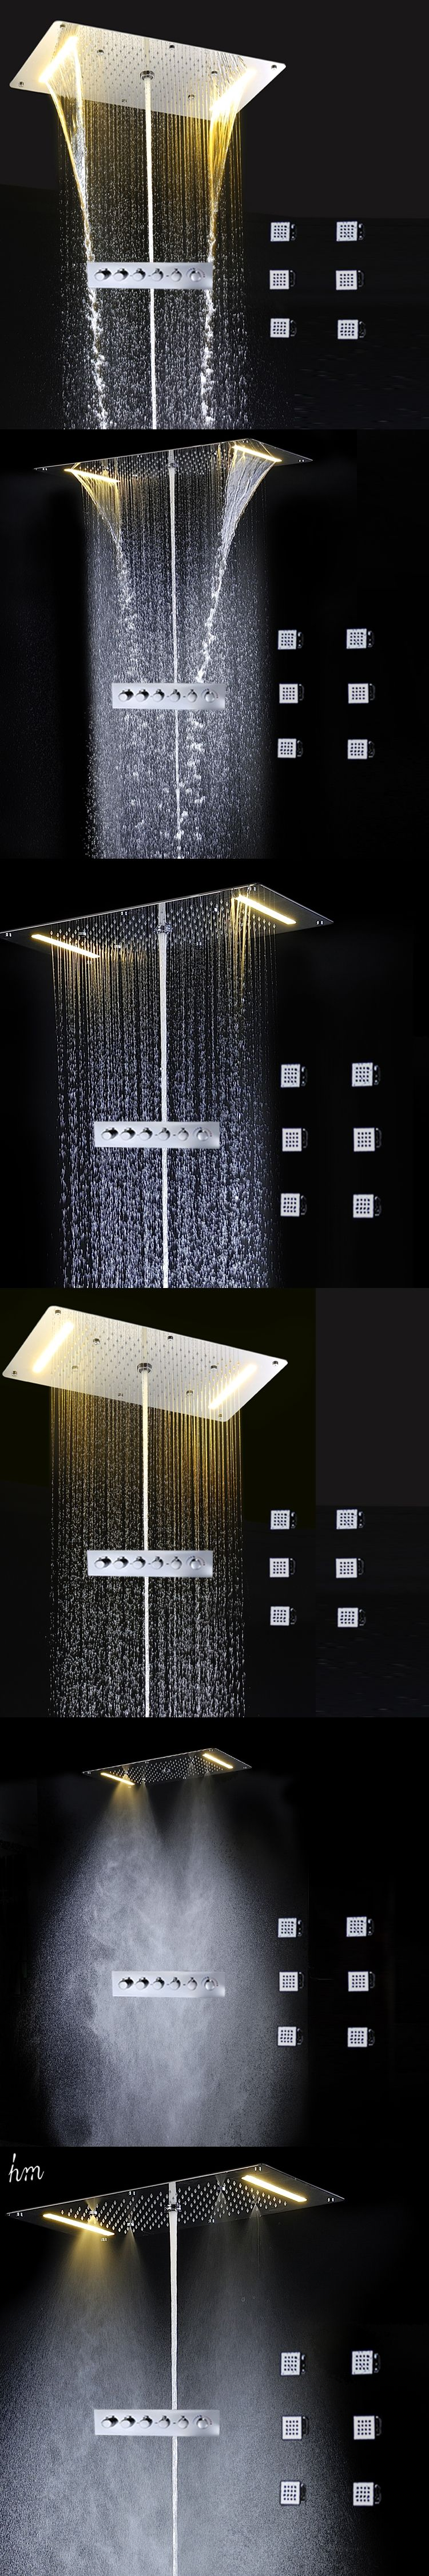 Embed Ceiling Rainfall Showers Set Led Electric Power Bathroom 5 Way ...